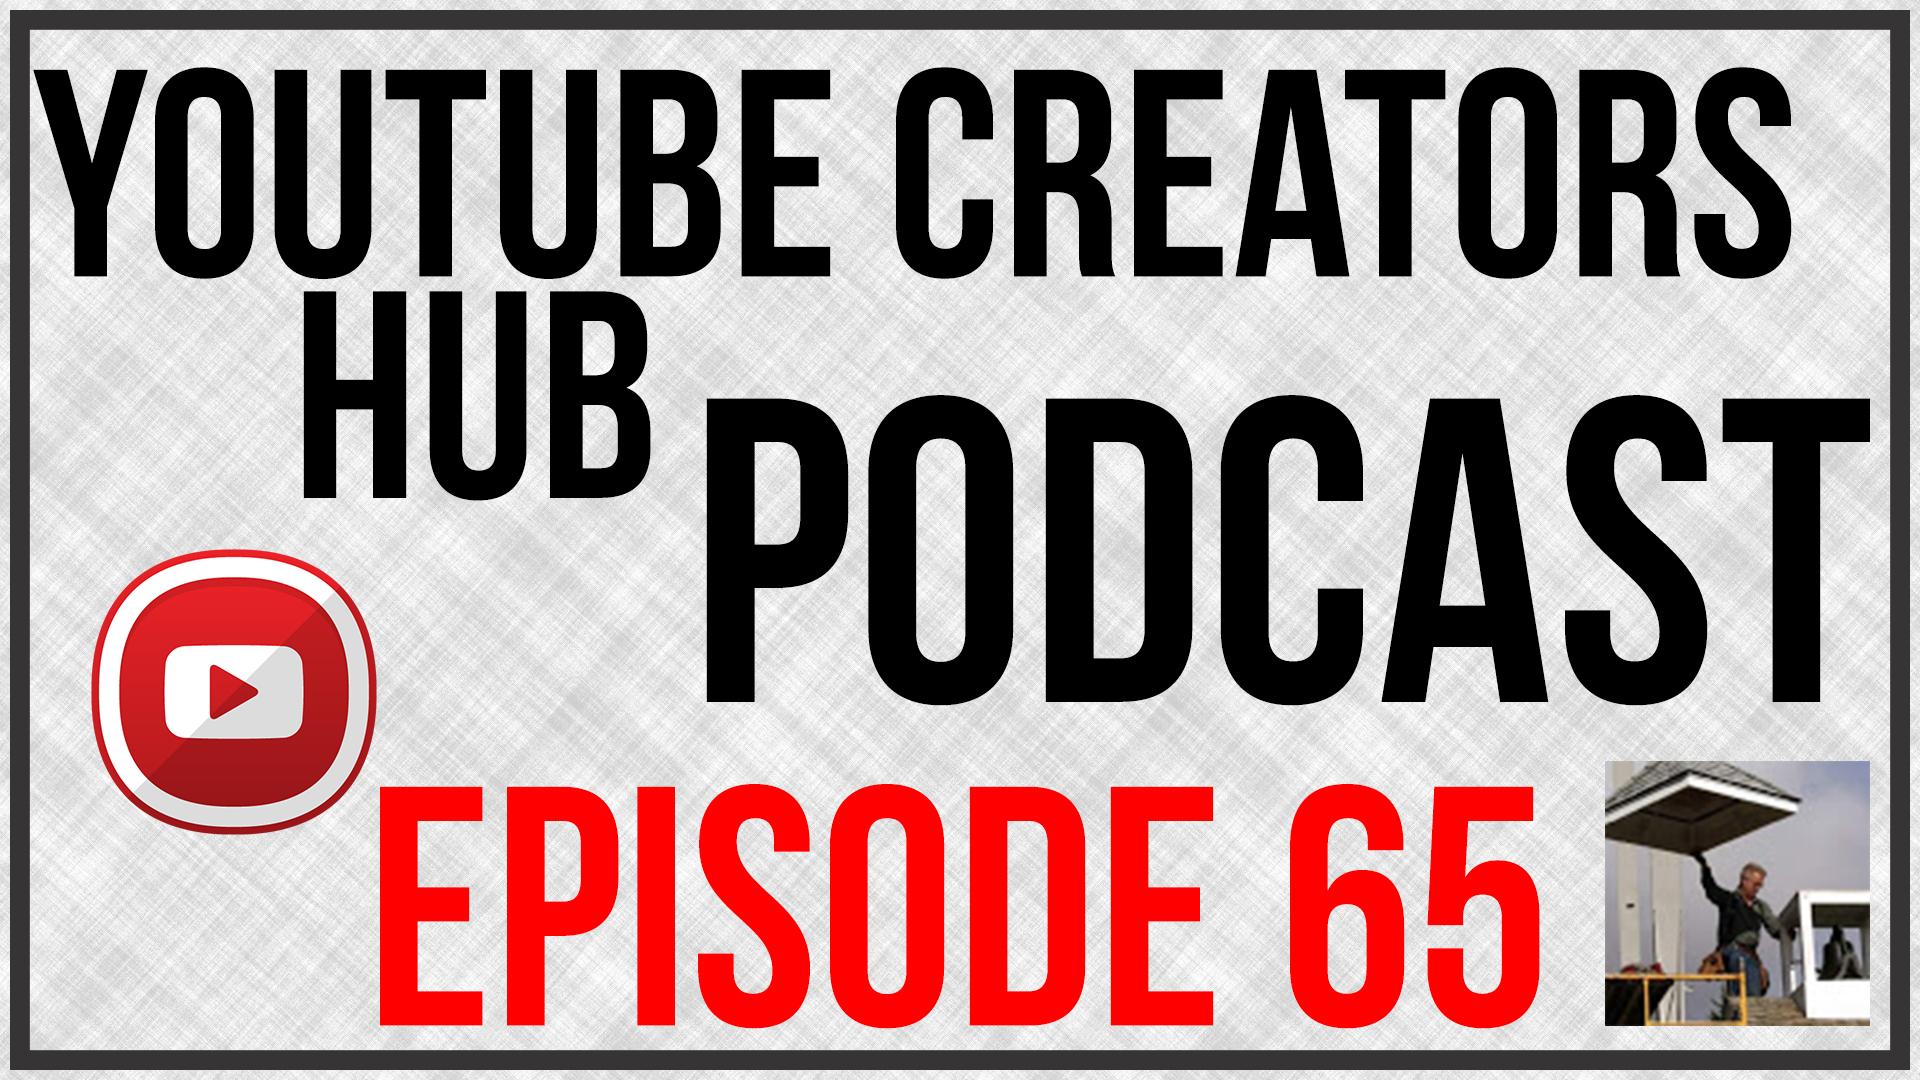 YouTube Creators Hub Podcast Episode 65